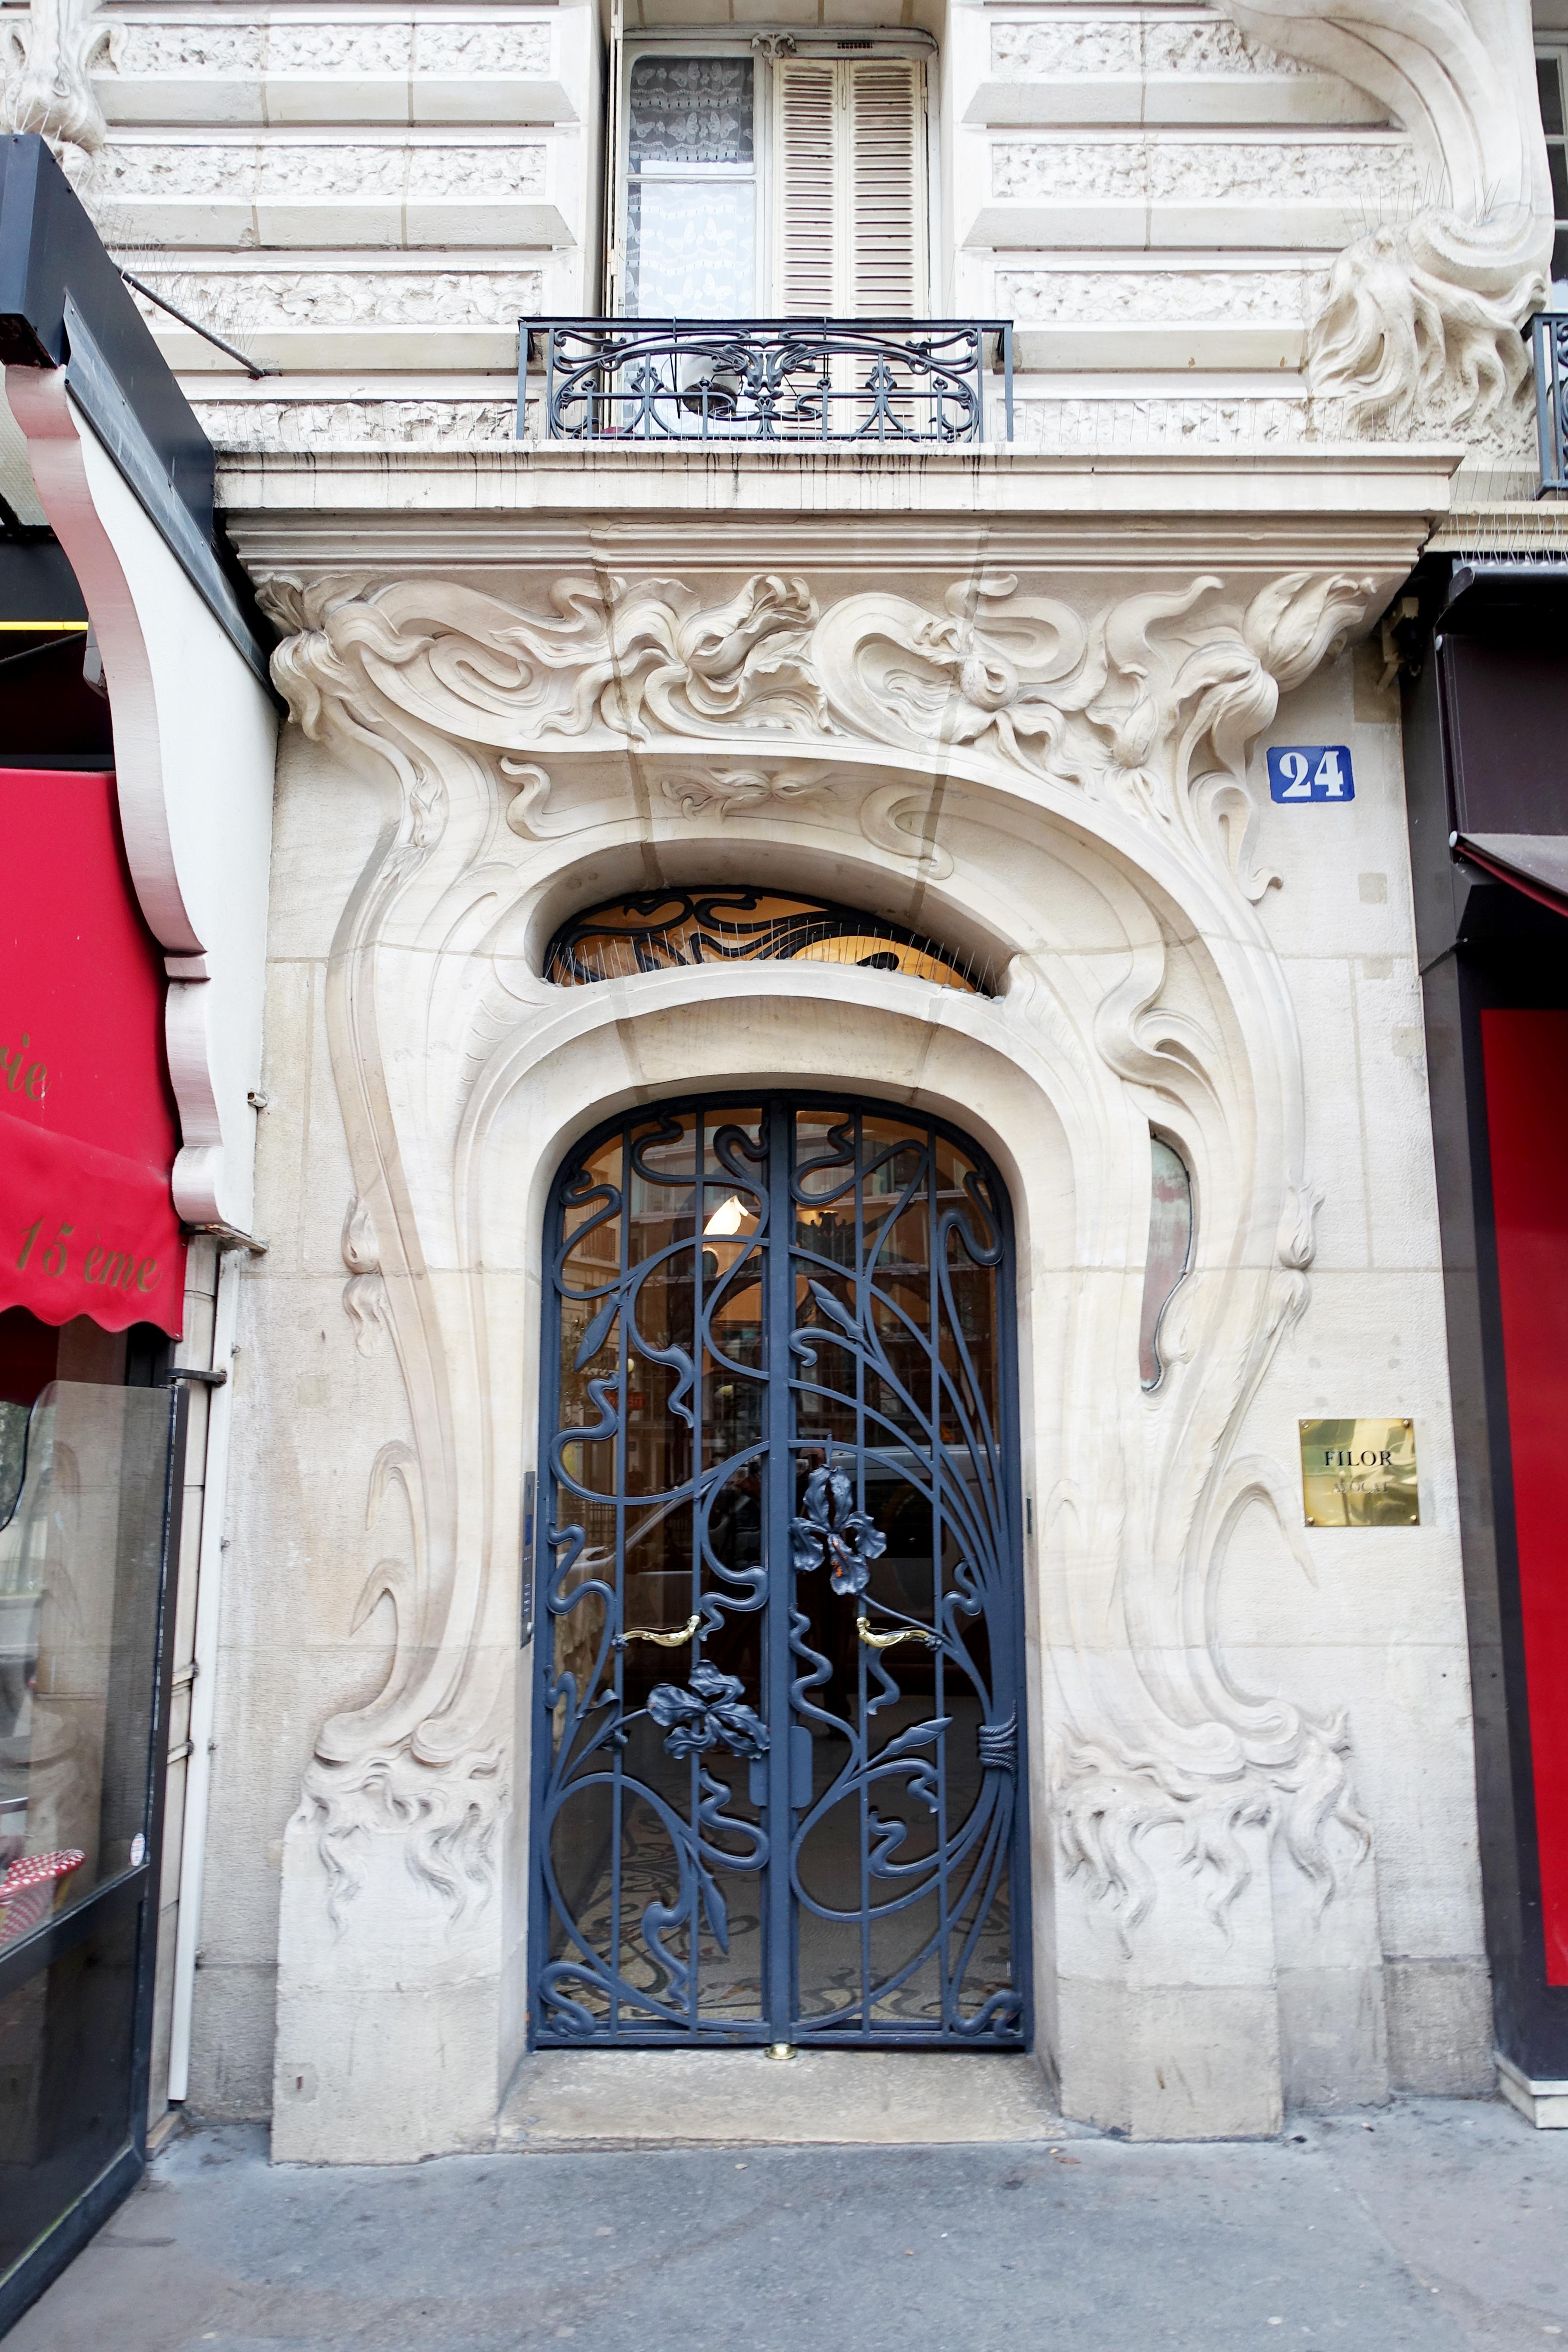 File:Door frame, 24 Place Etienne Pernet, 75015 Paris, 11 February ...